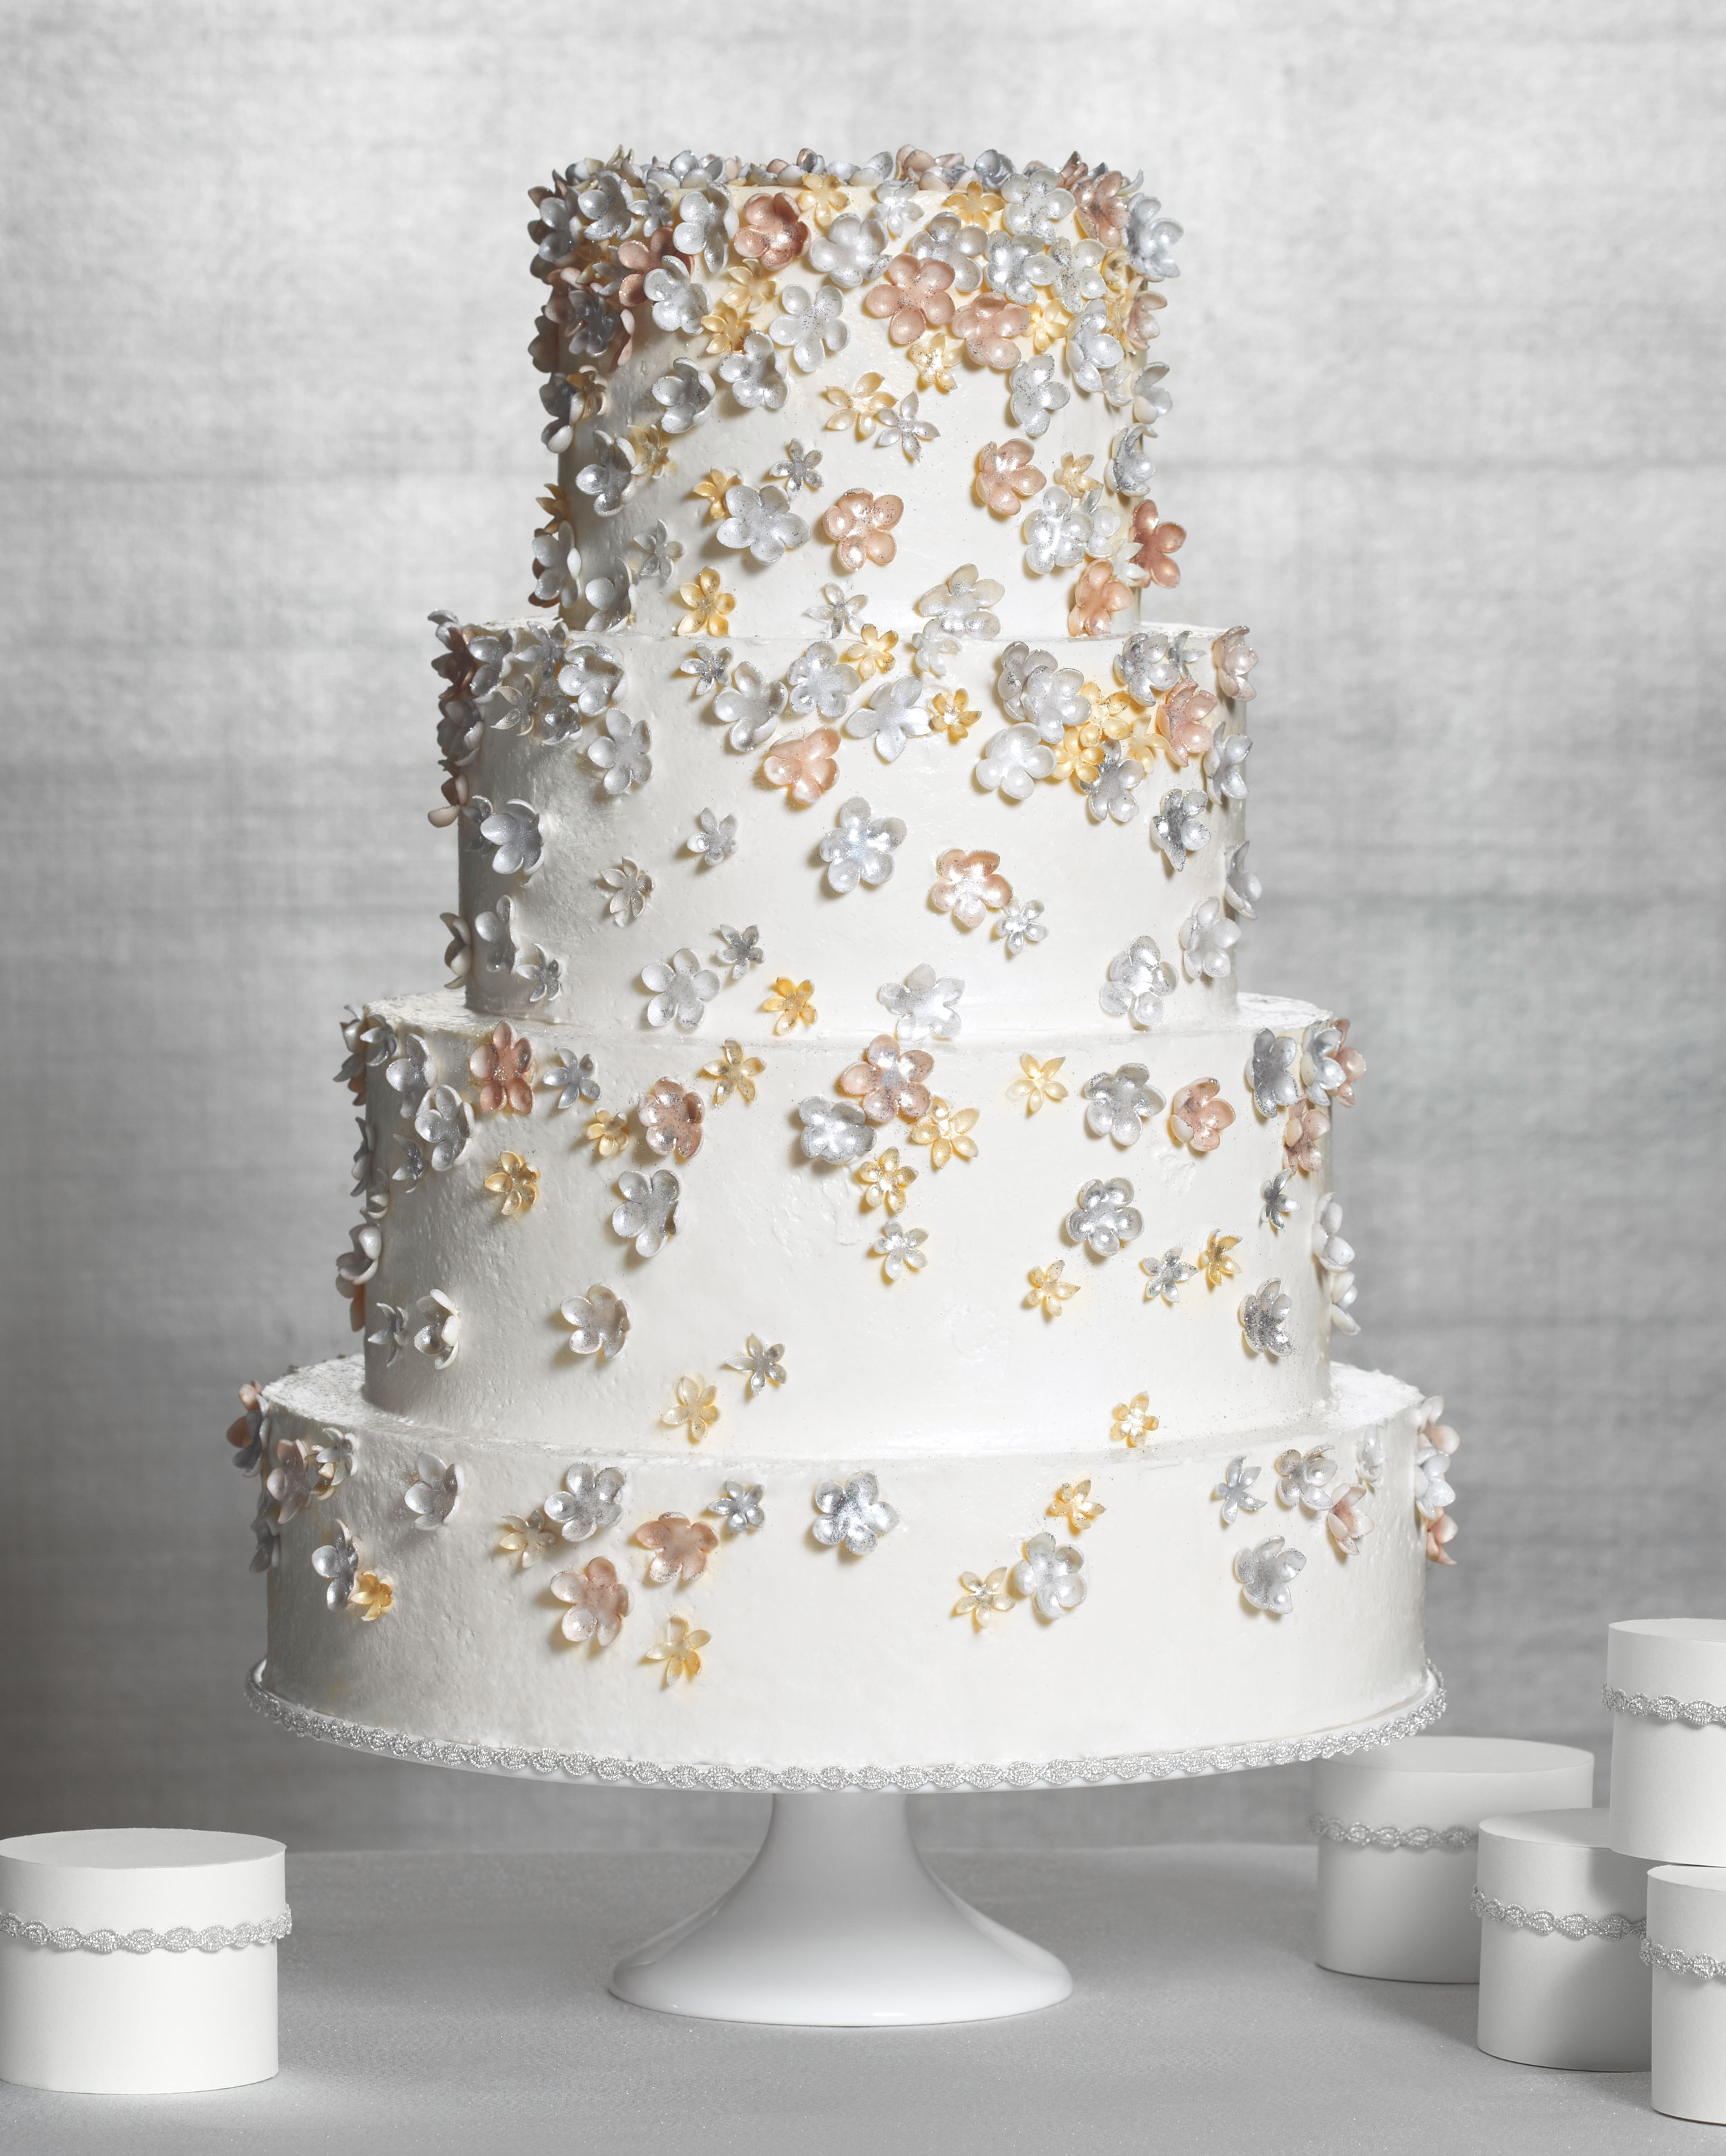 sparkle-flower-cake-174-183-comp-mwd110603.jpg